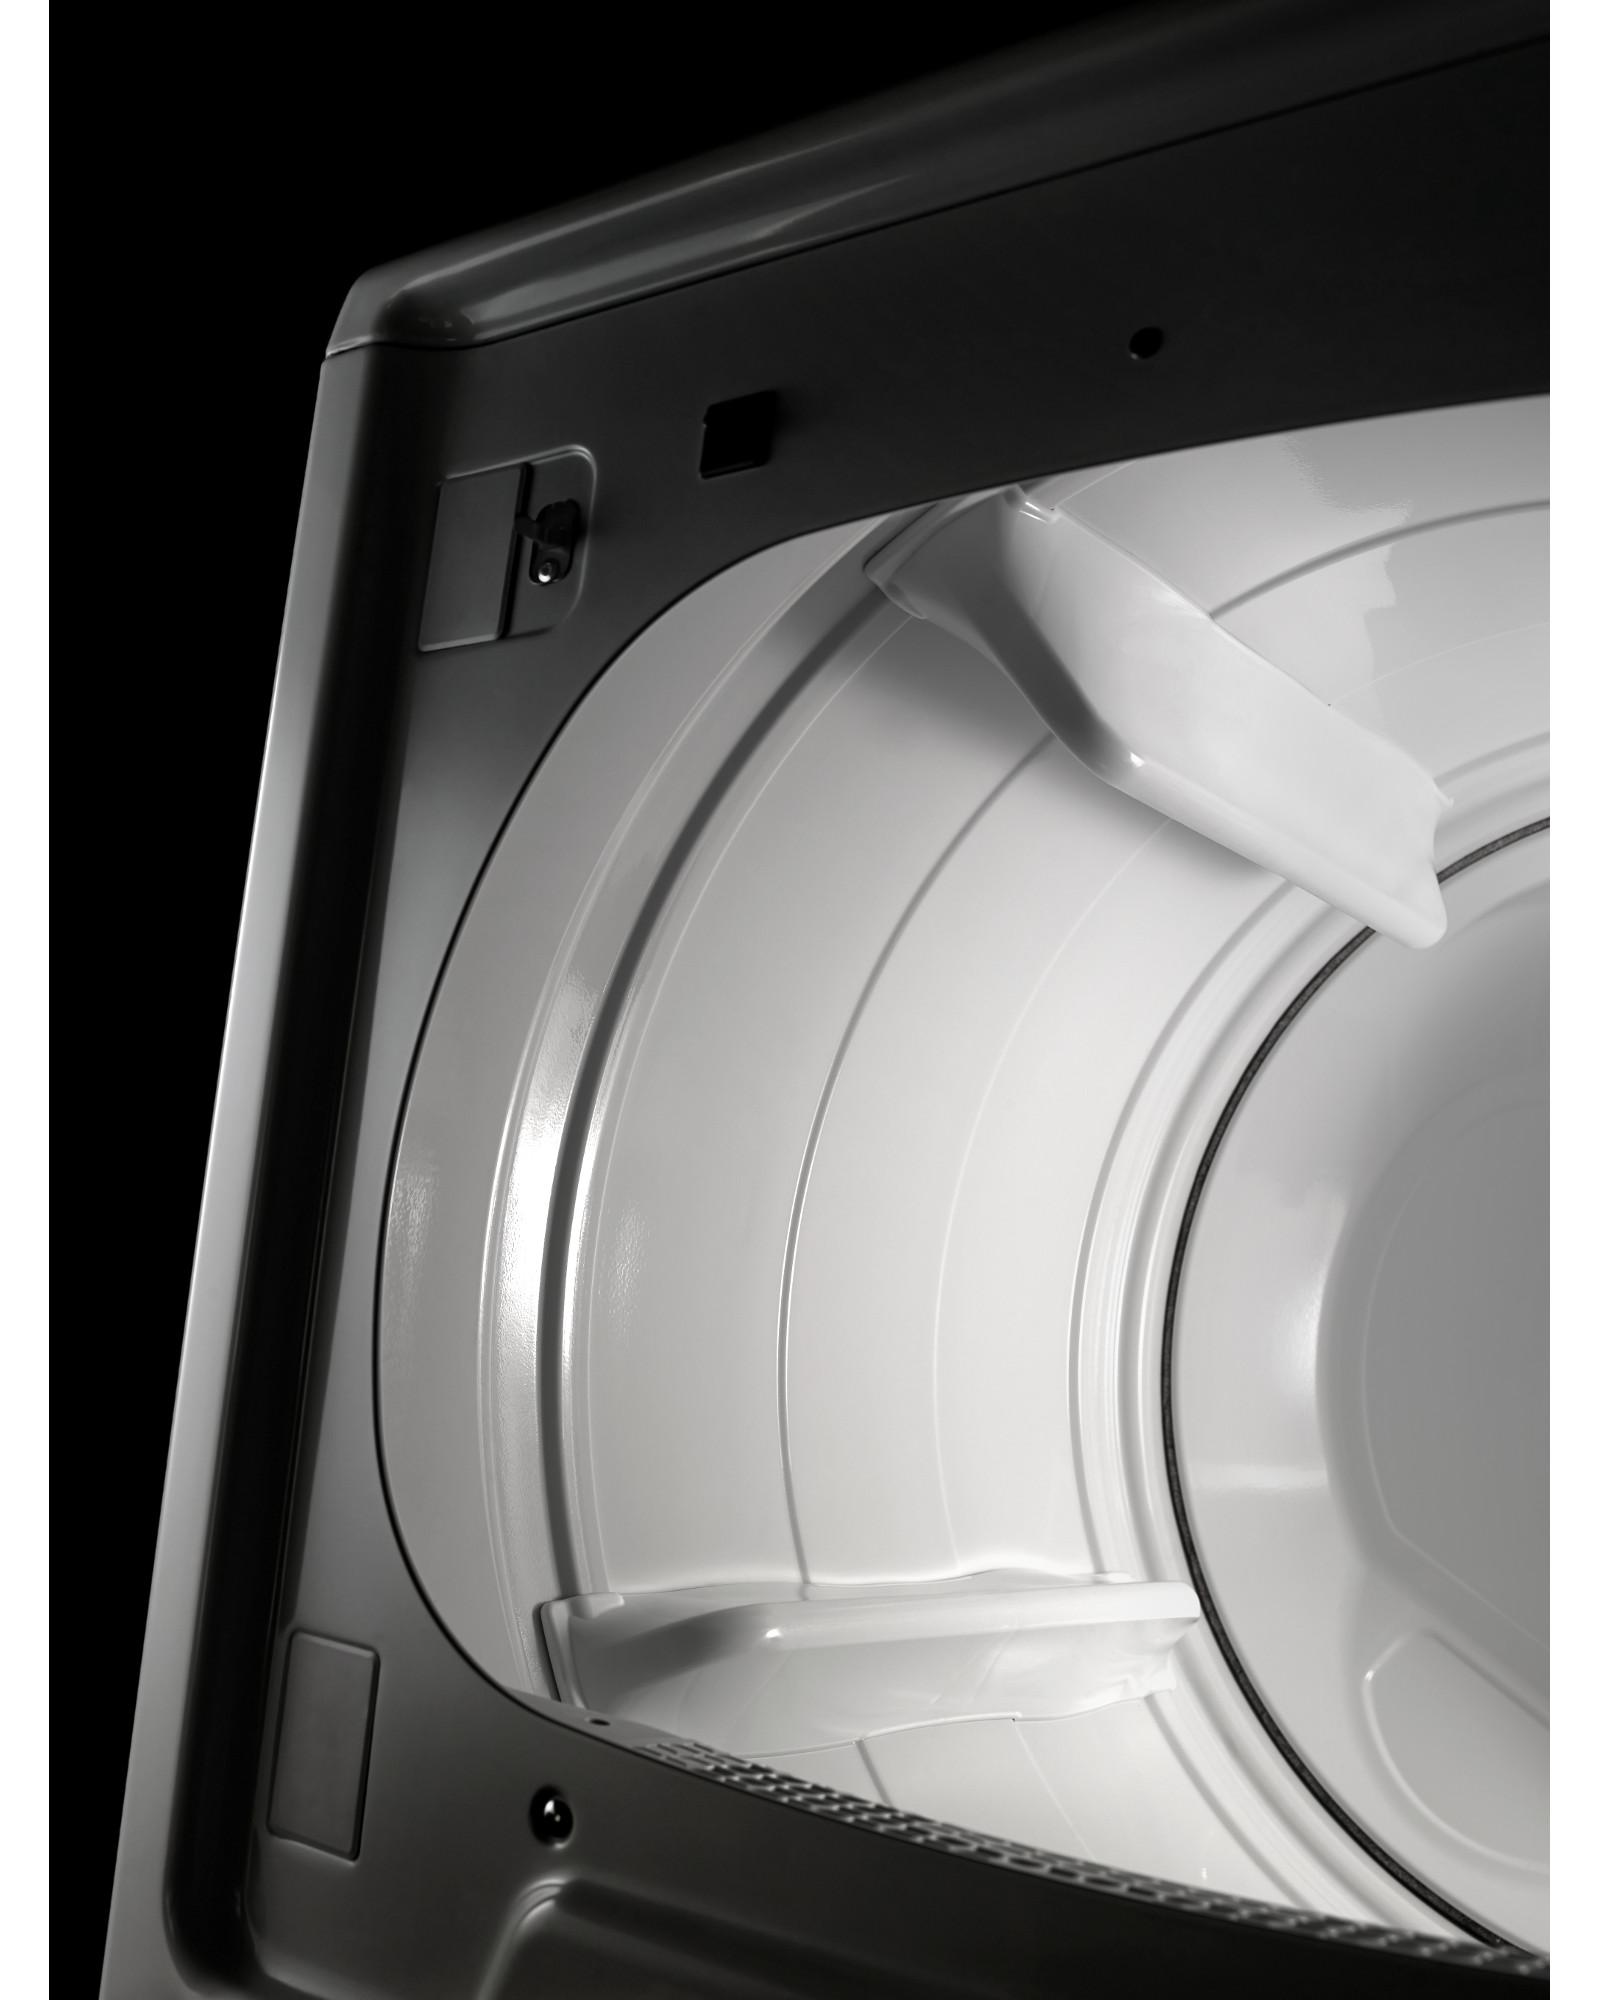 Maytag MGDB835DW Bravos 8.8 cu. ft. Gas Dryer - White